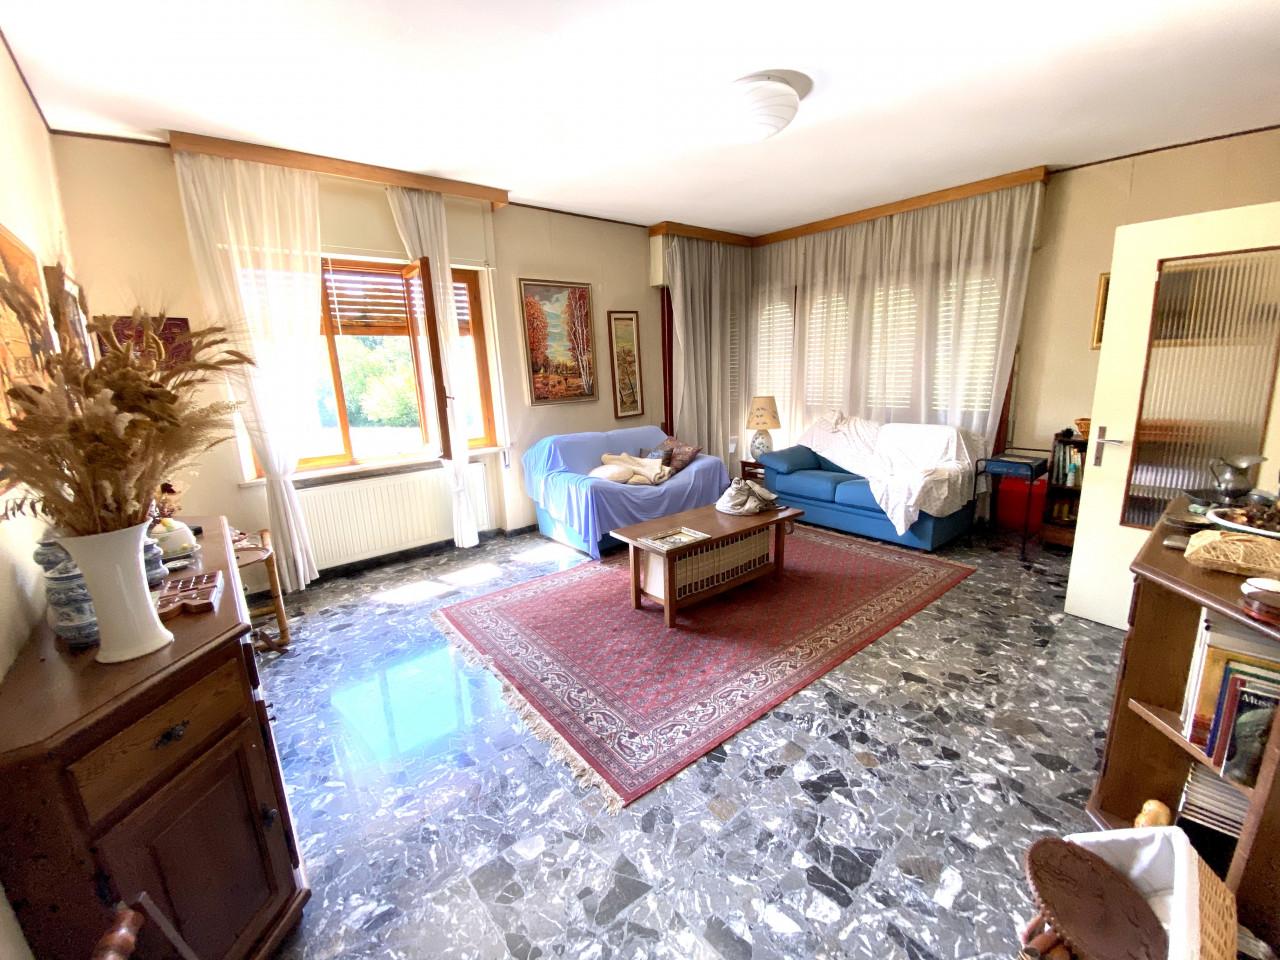 Casa singola con capannone in vendita in centro a Budoia - Rif. V.D.1 https://images.gestionaleimmobiliare.it/foto/annunci/200702/2265893/1280x1280/001__img_2975.jpg